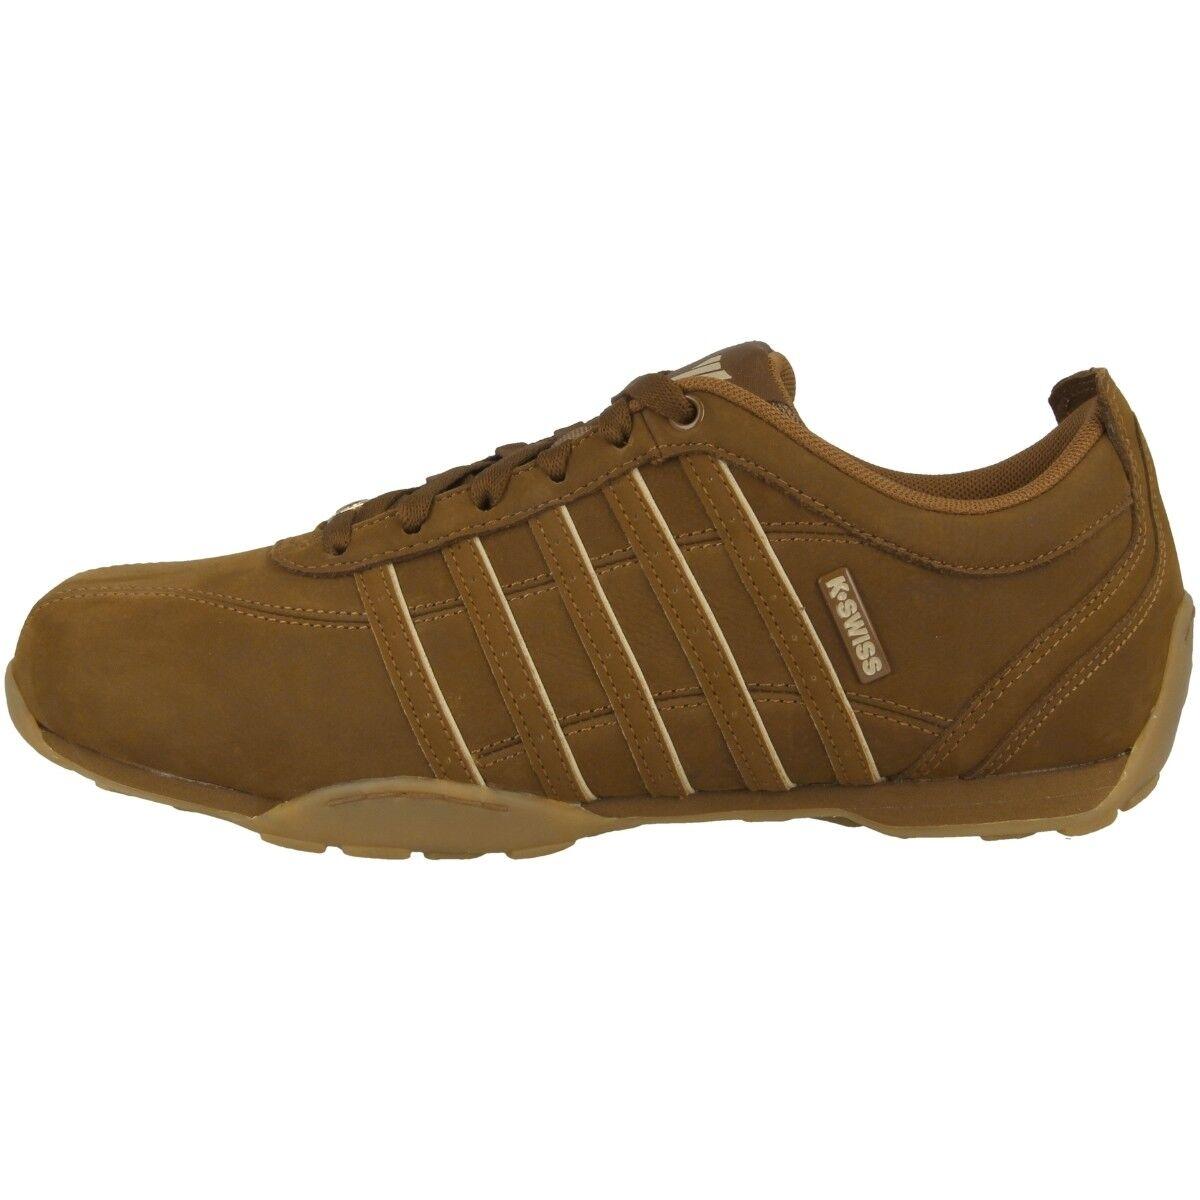 K-Swiss Arvee Arvee Arvee 1.5 zapatilla de deporte Sport Freizeit zapatos monks robe khaki 02453-218  ahorra hasta un 30-50% de descuento